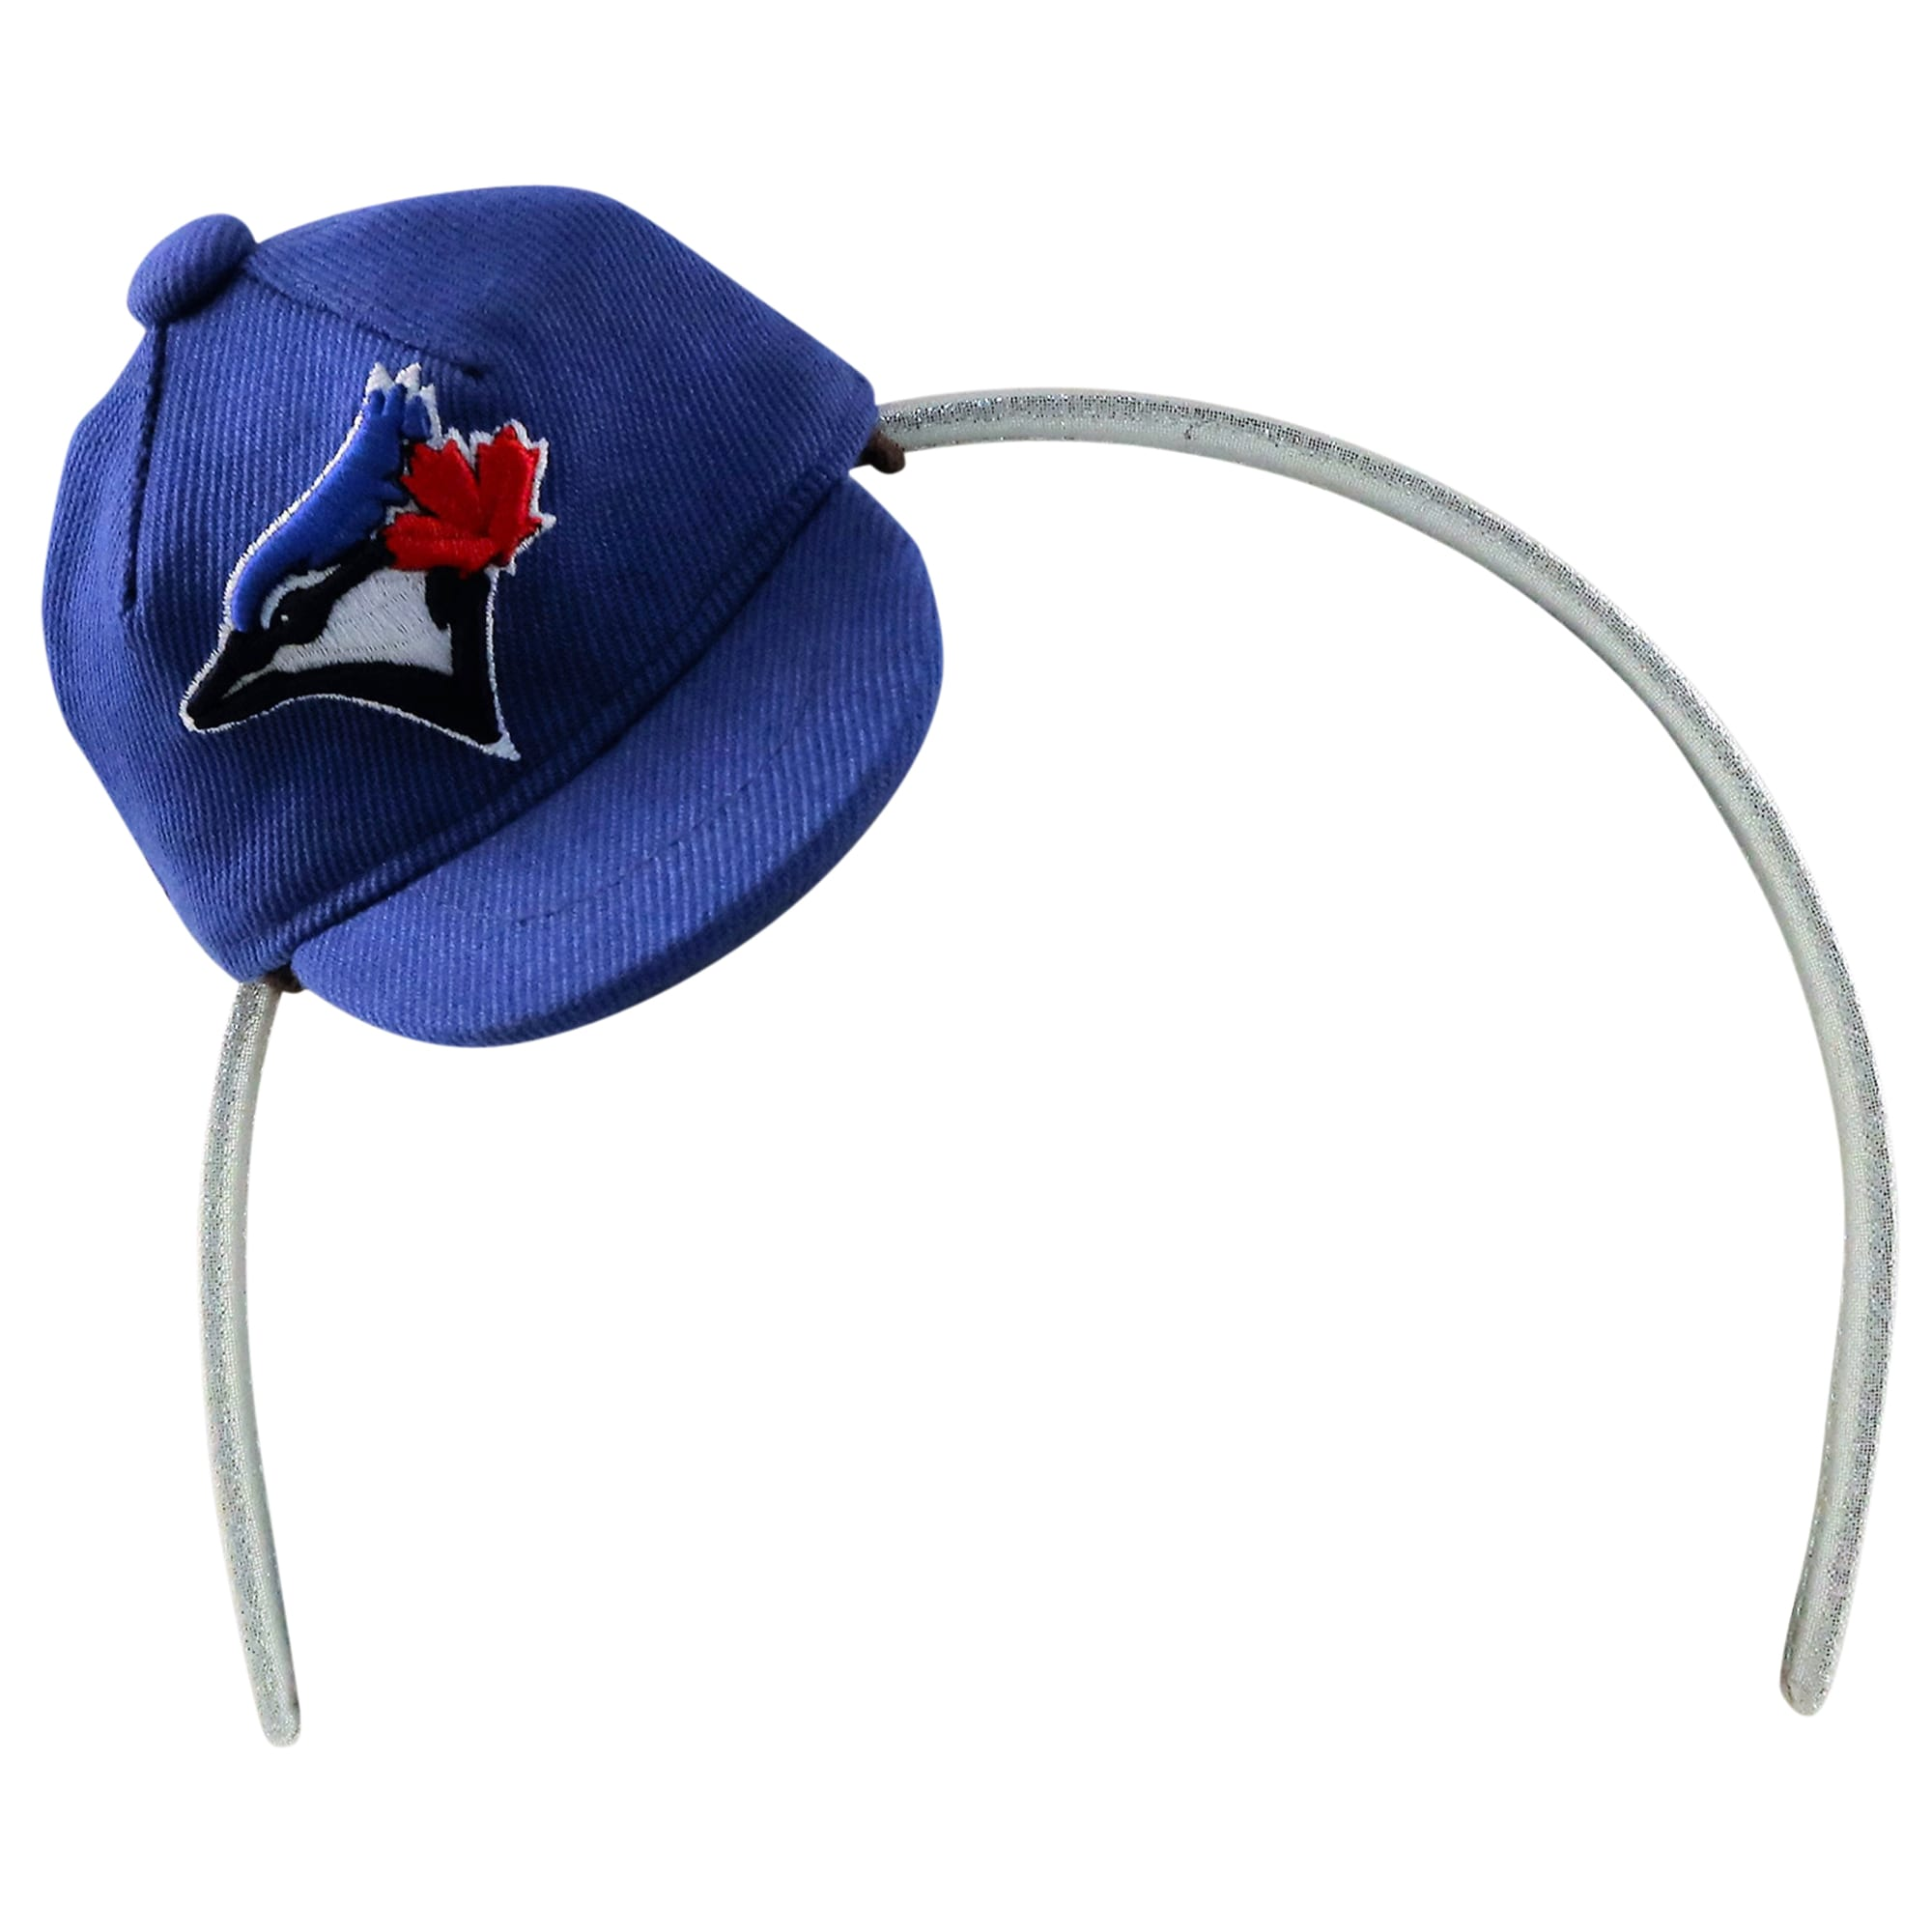 Toronto Blue Jays Women's Team Toppers Headband - Blue